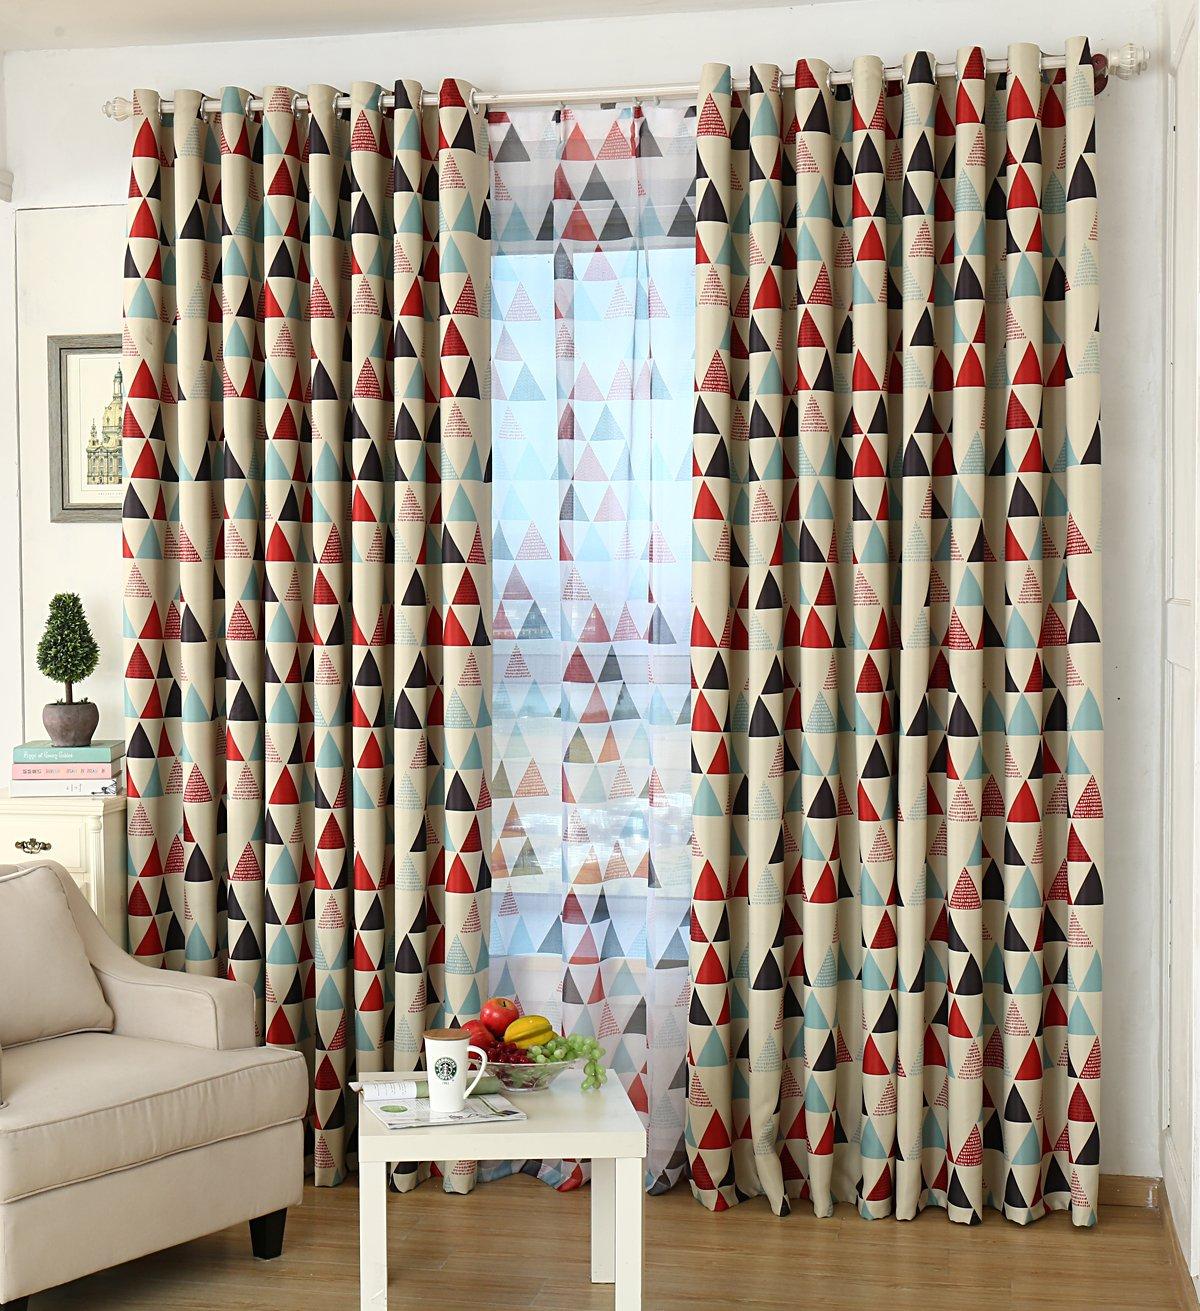 GYROHOME Tartan Lozenge Blackout Curtain Thermal Insulated Washable Drape Noise Reducing No Formaldehyde GYC2054